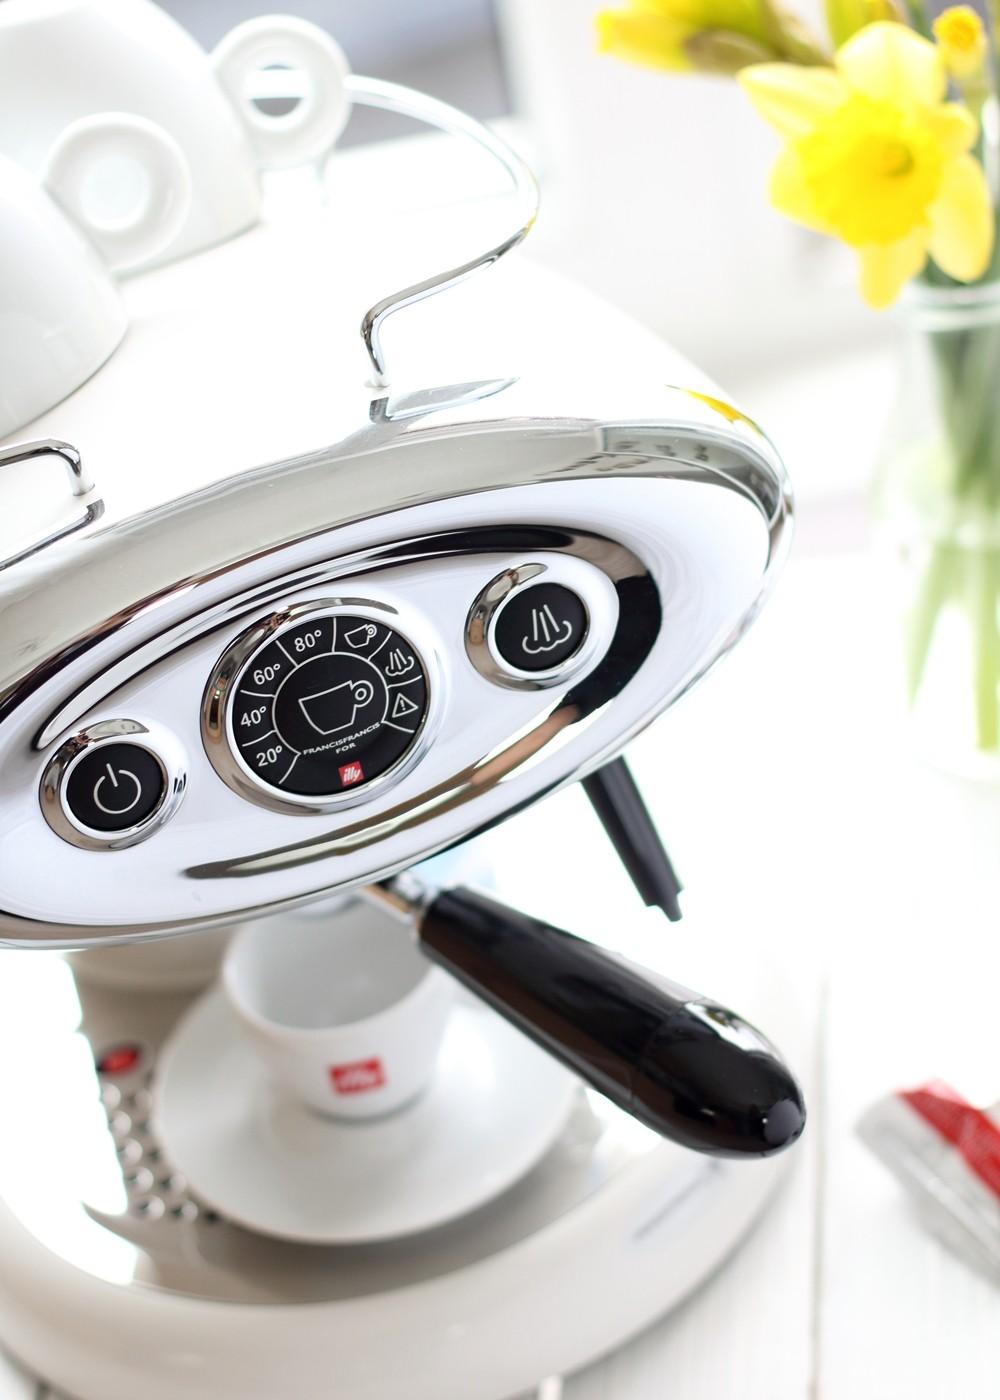 Illy Iperespresso Espressomaschine weiss 7